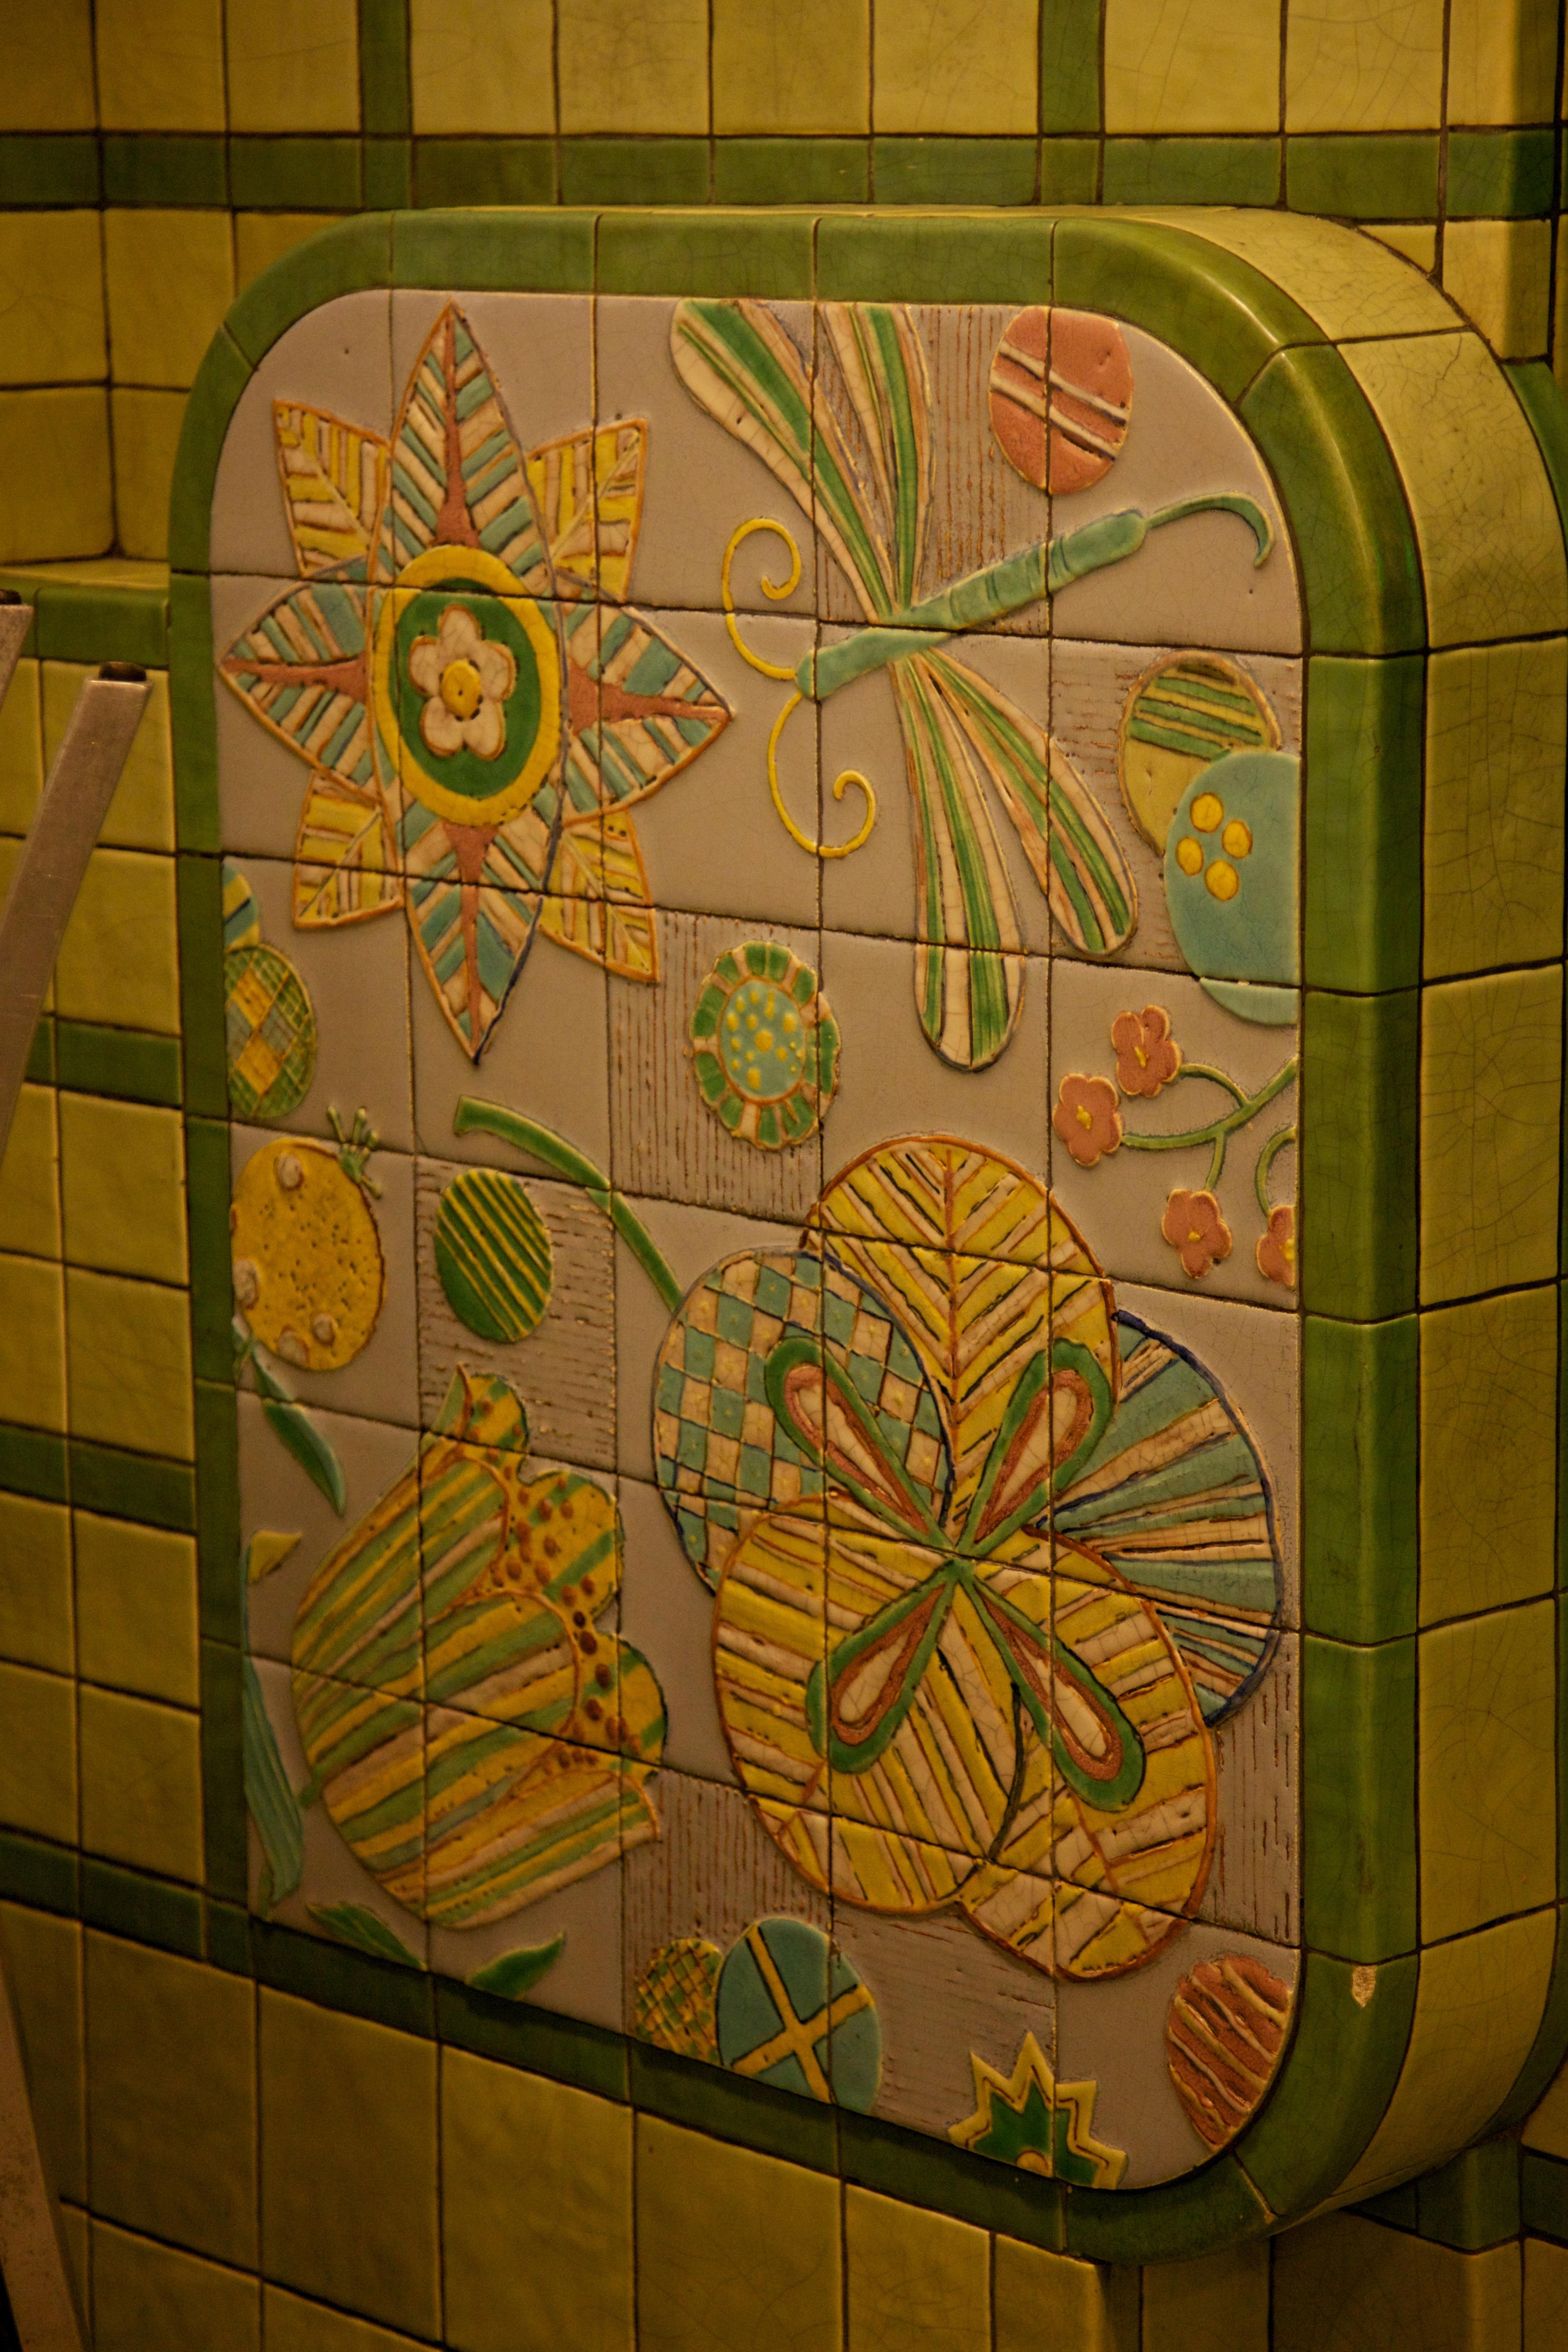 File:Nature - Art Deco Style (9333020293).jpg - Wikimedia Commons